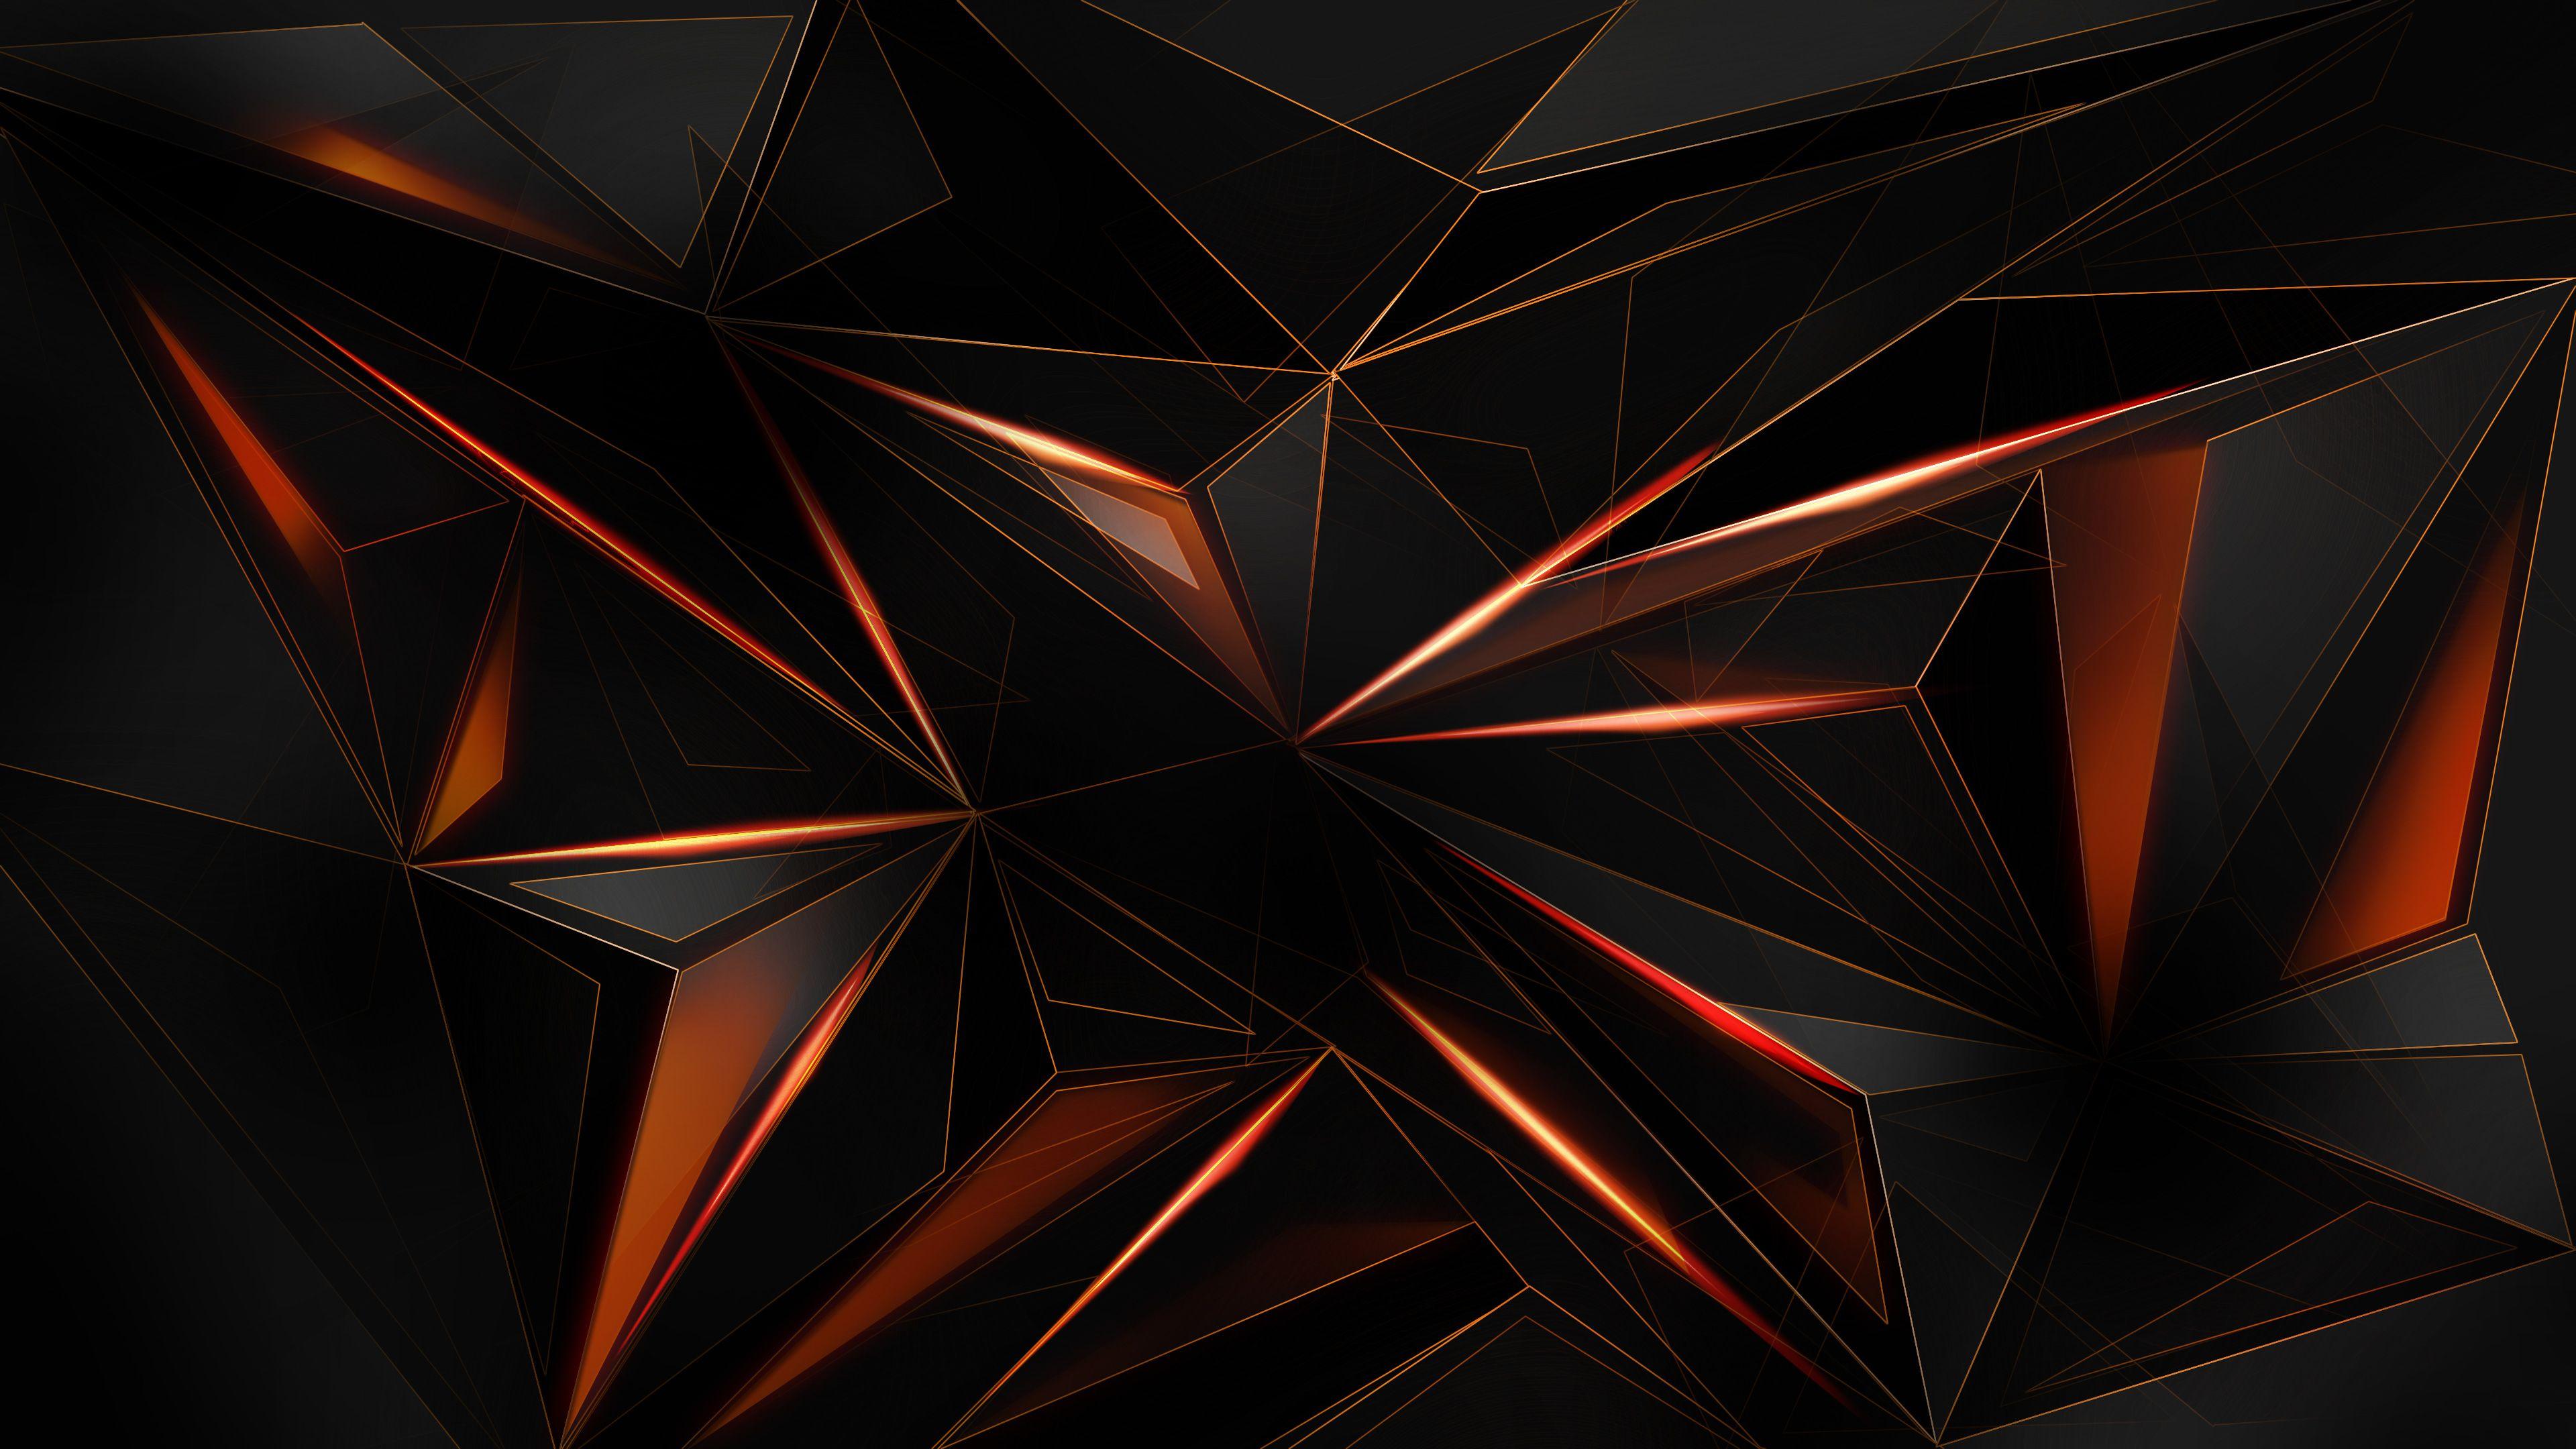 Abstract Shapes Polygon Hd 4k Deviantart Abstract